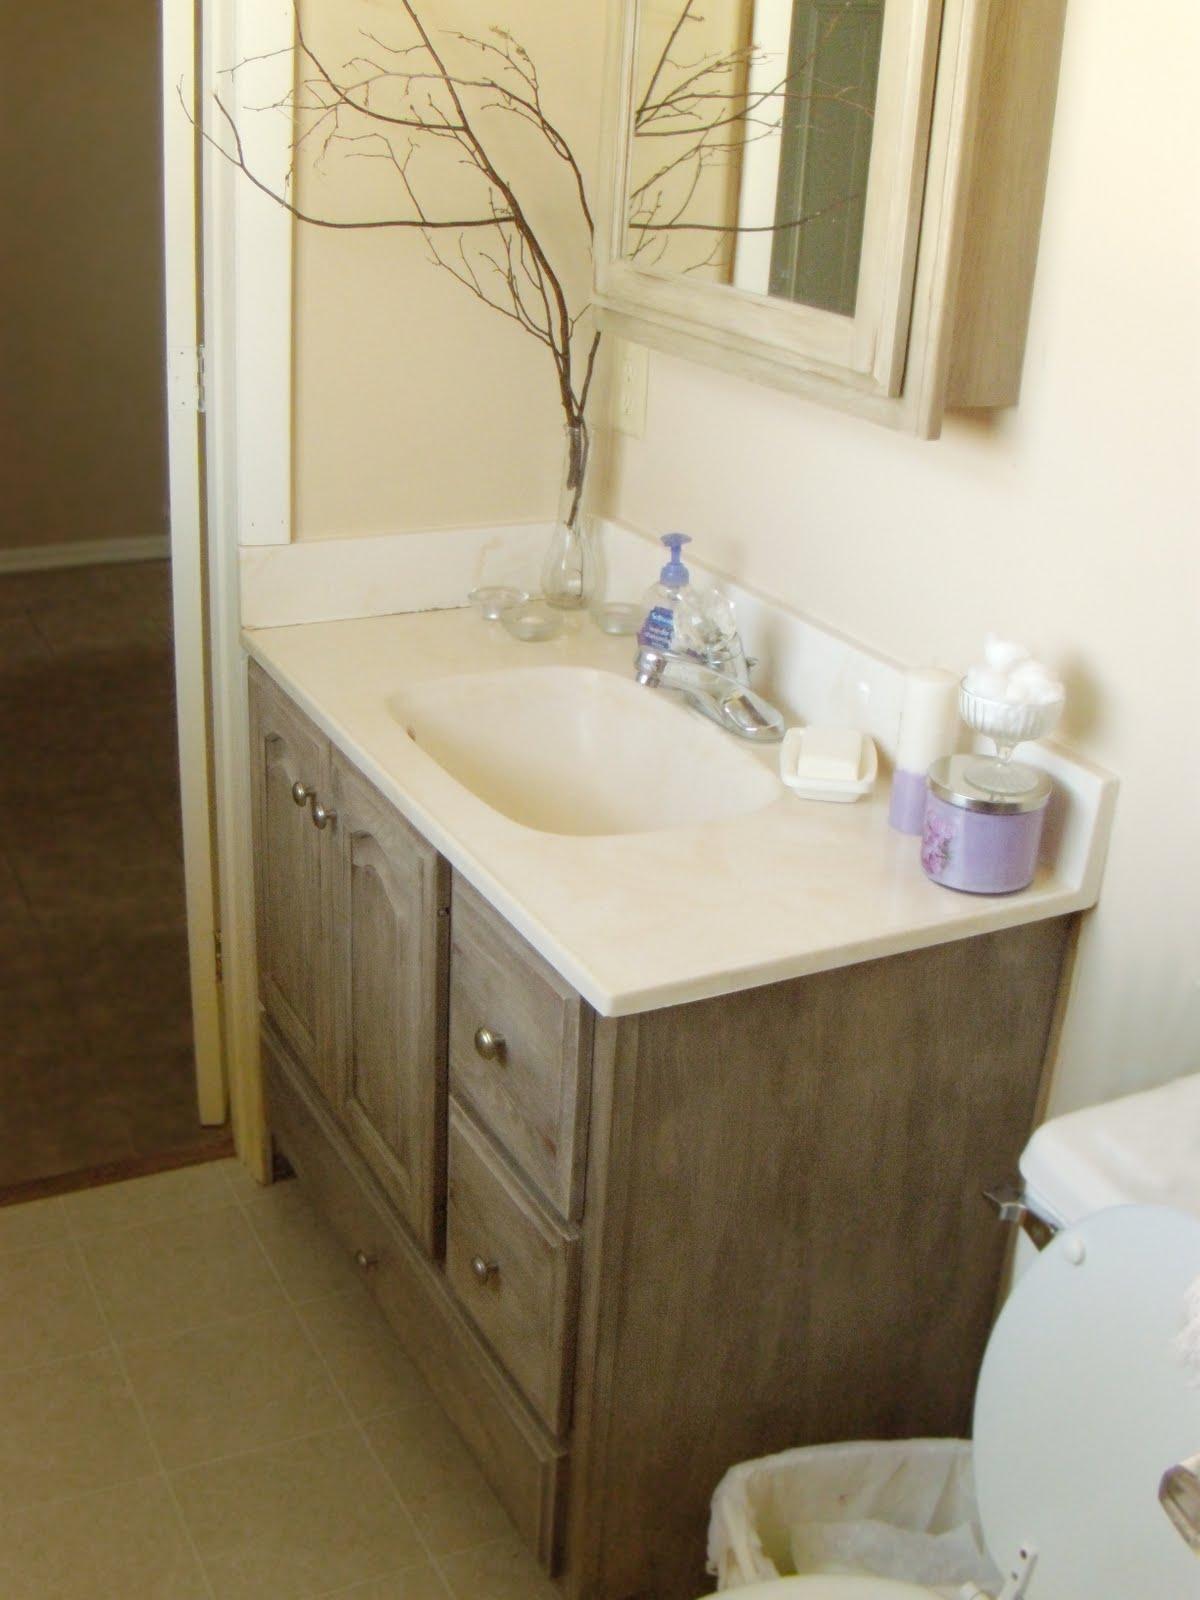 Down On Sanford Bathroom Vanity Redo